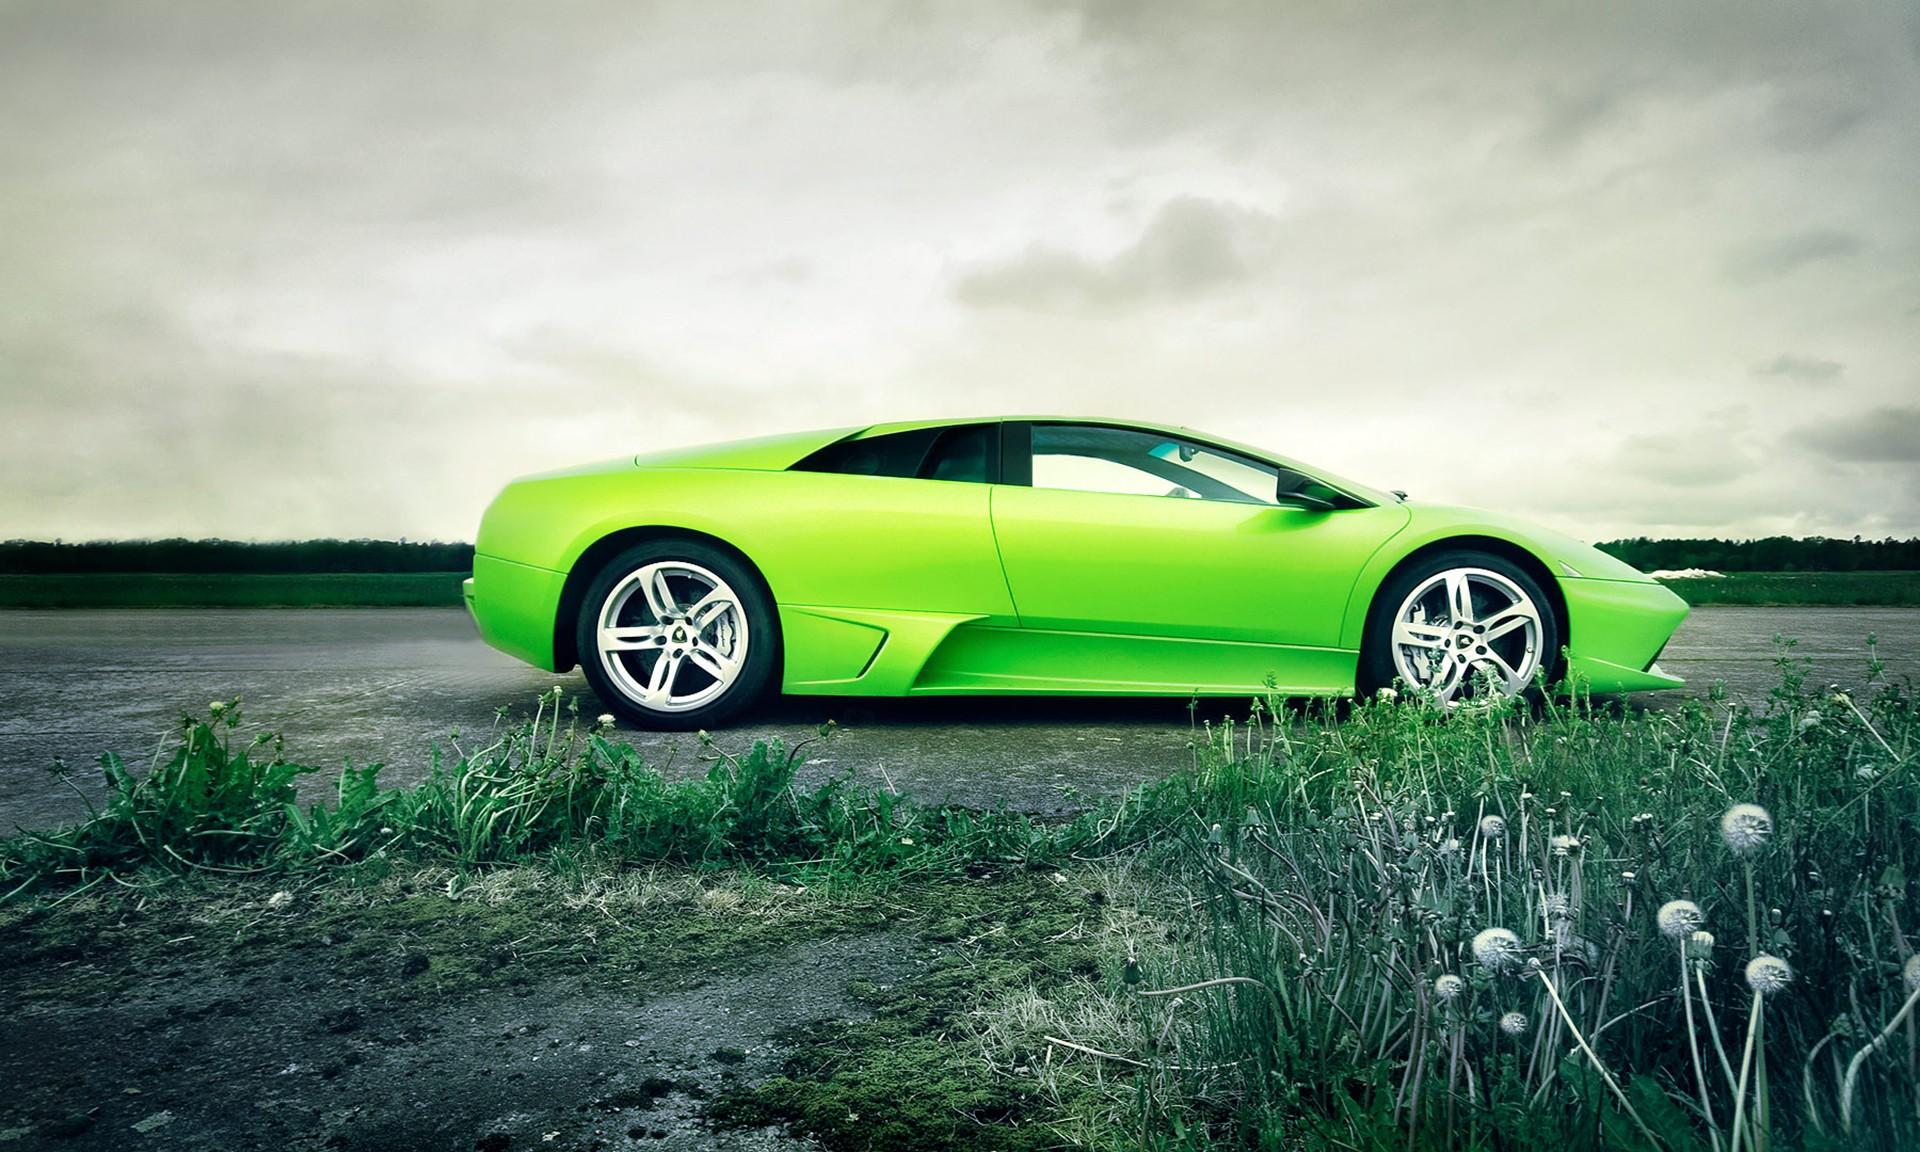 30 Green Cars Wallpapers On Wallpapersafari